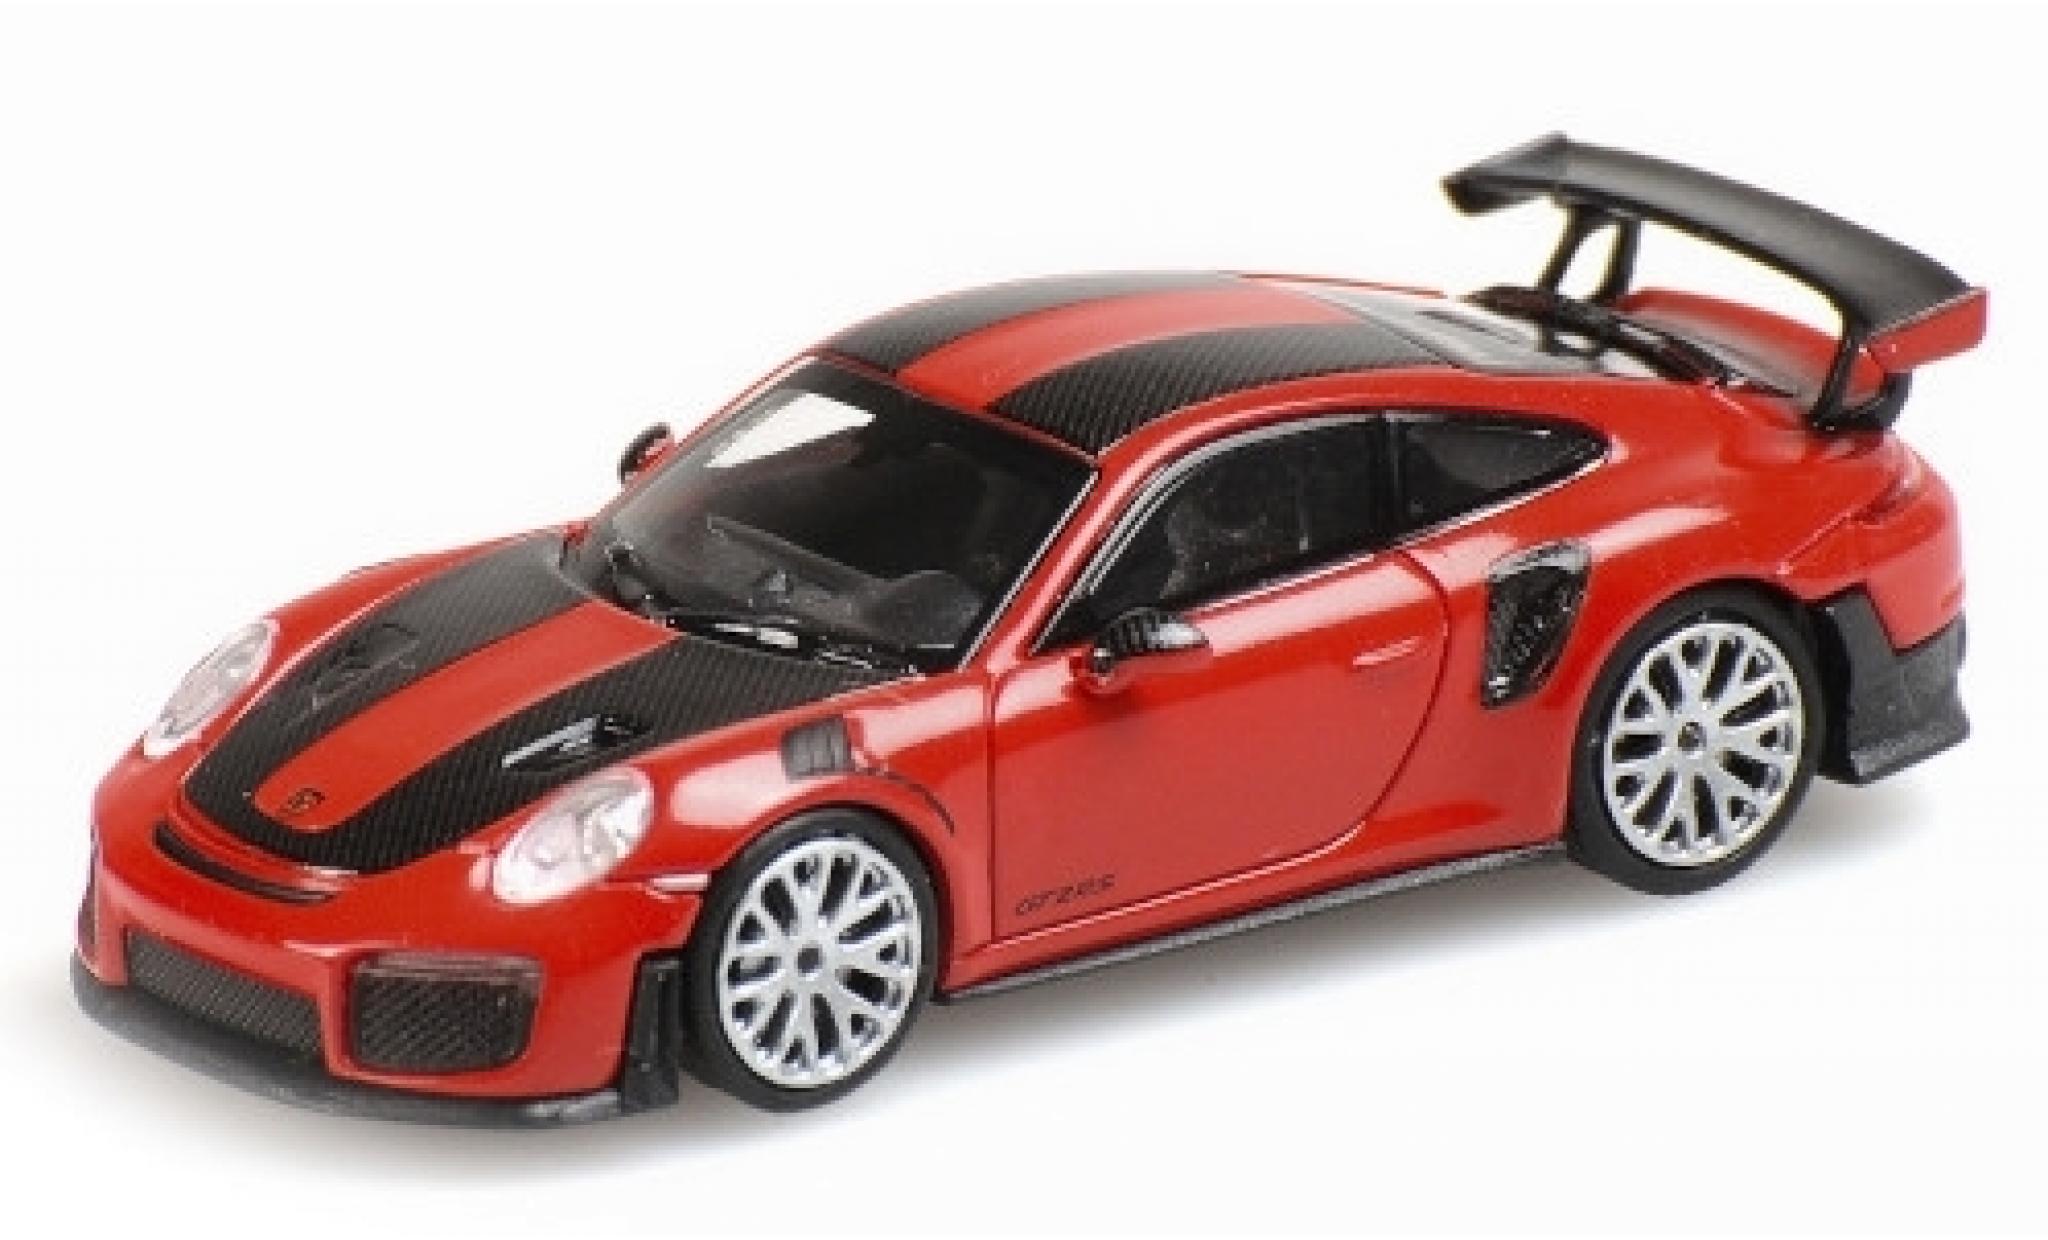 Porsche 991 GT2 RS 1/87 Minichamps 911 red 2018 avec Carbon-Streifen